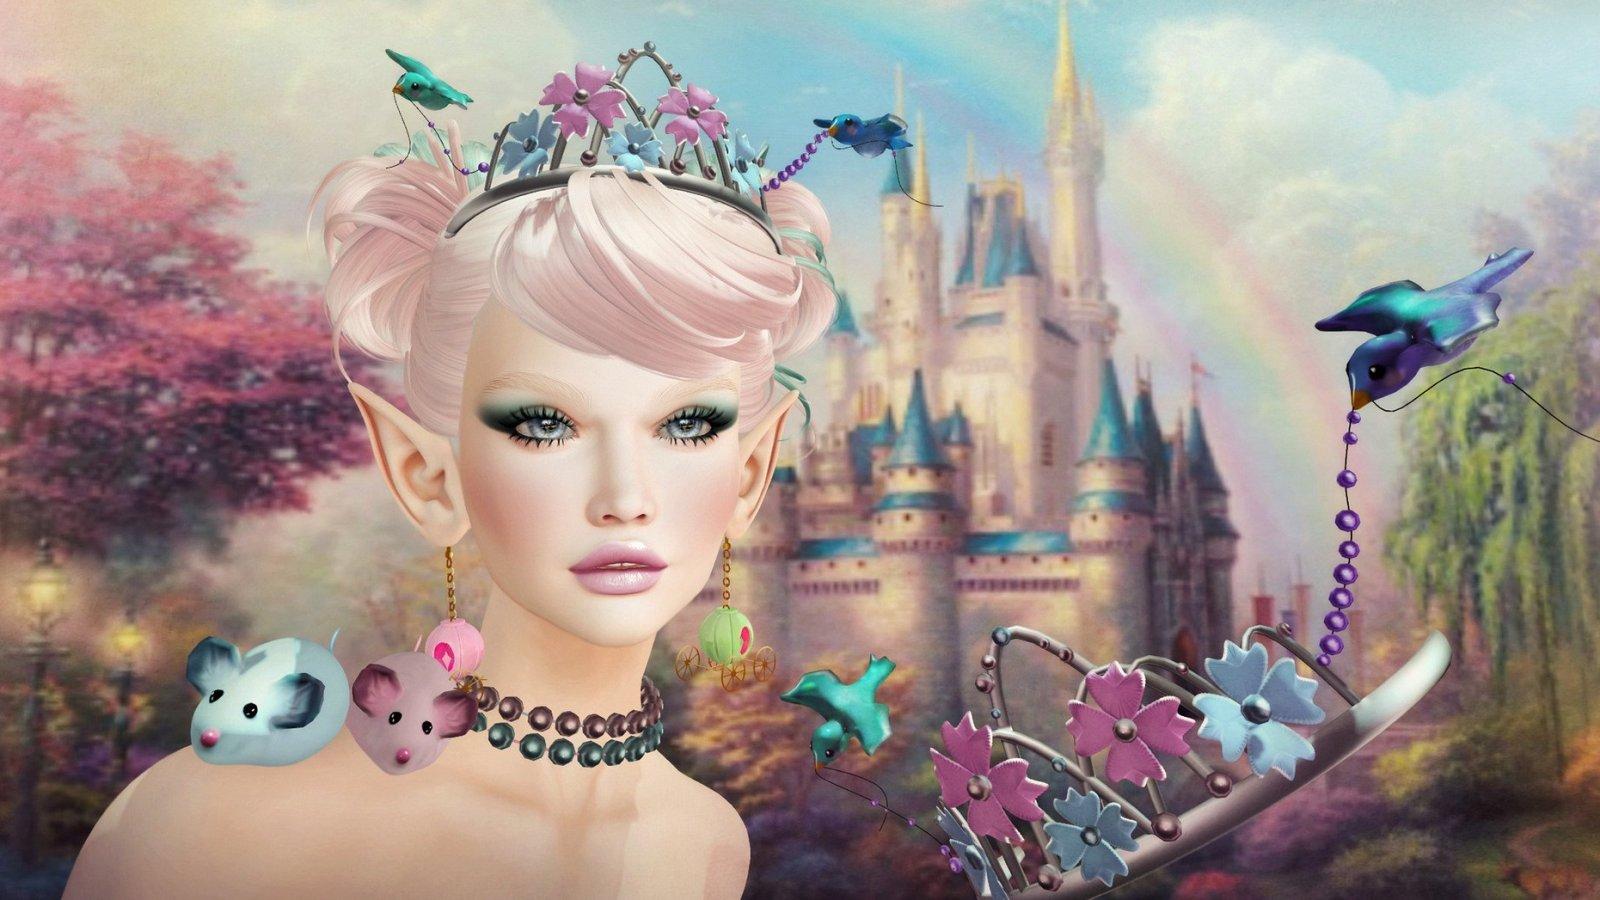 Tale of Cinderella